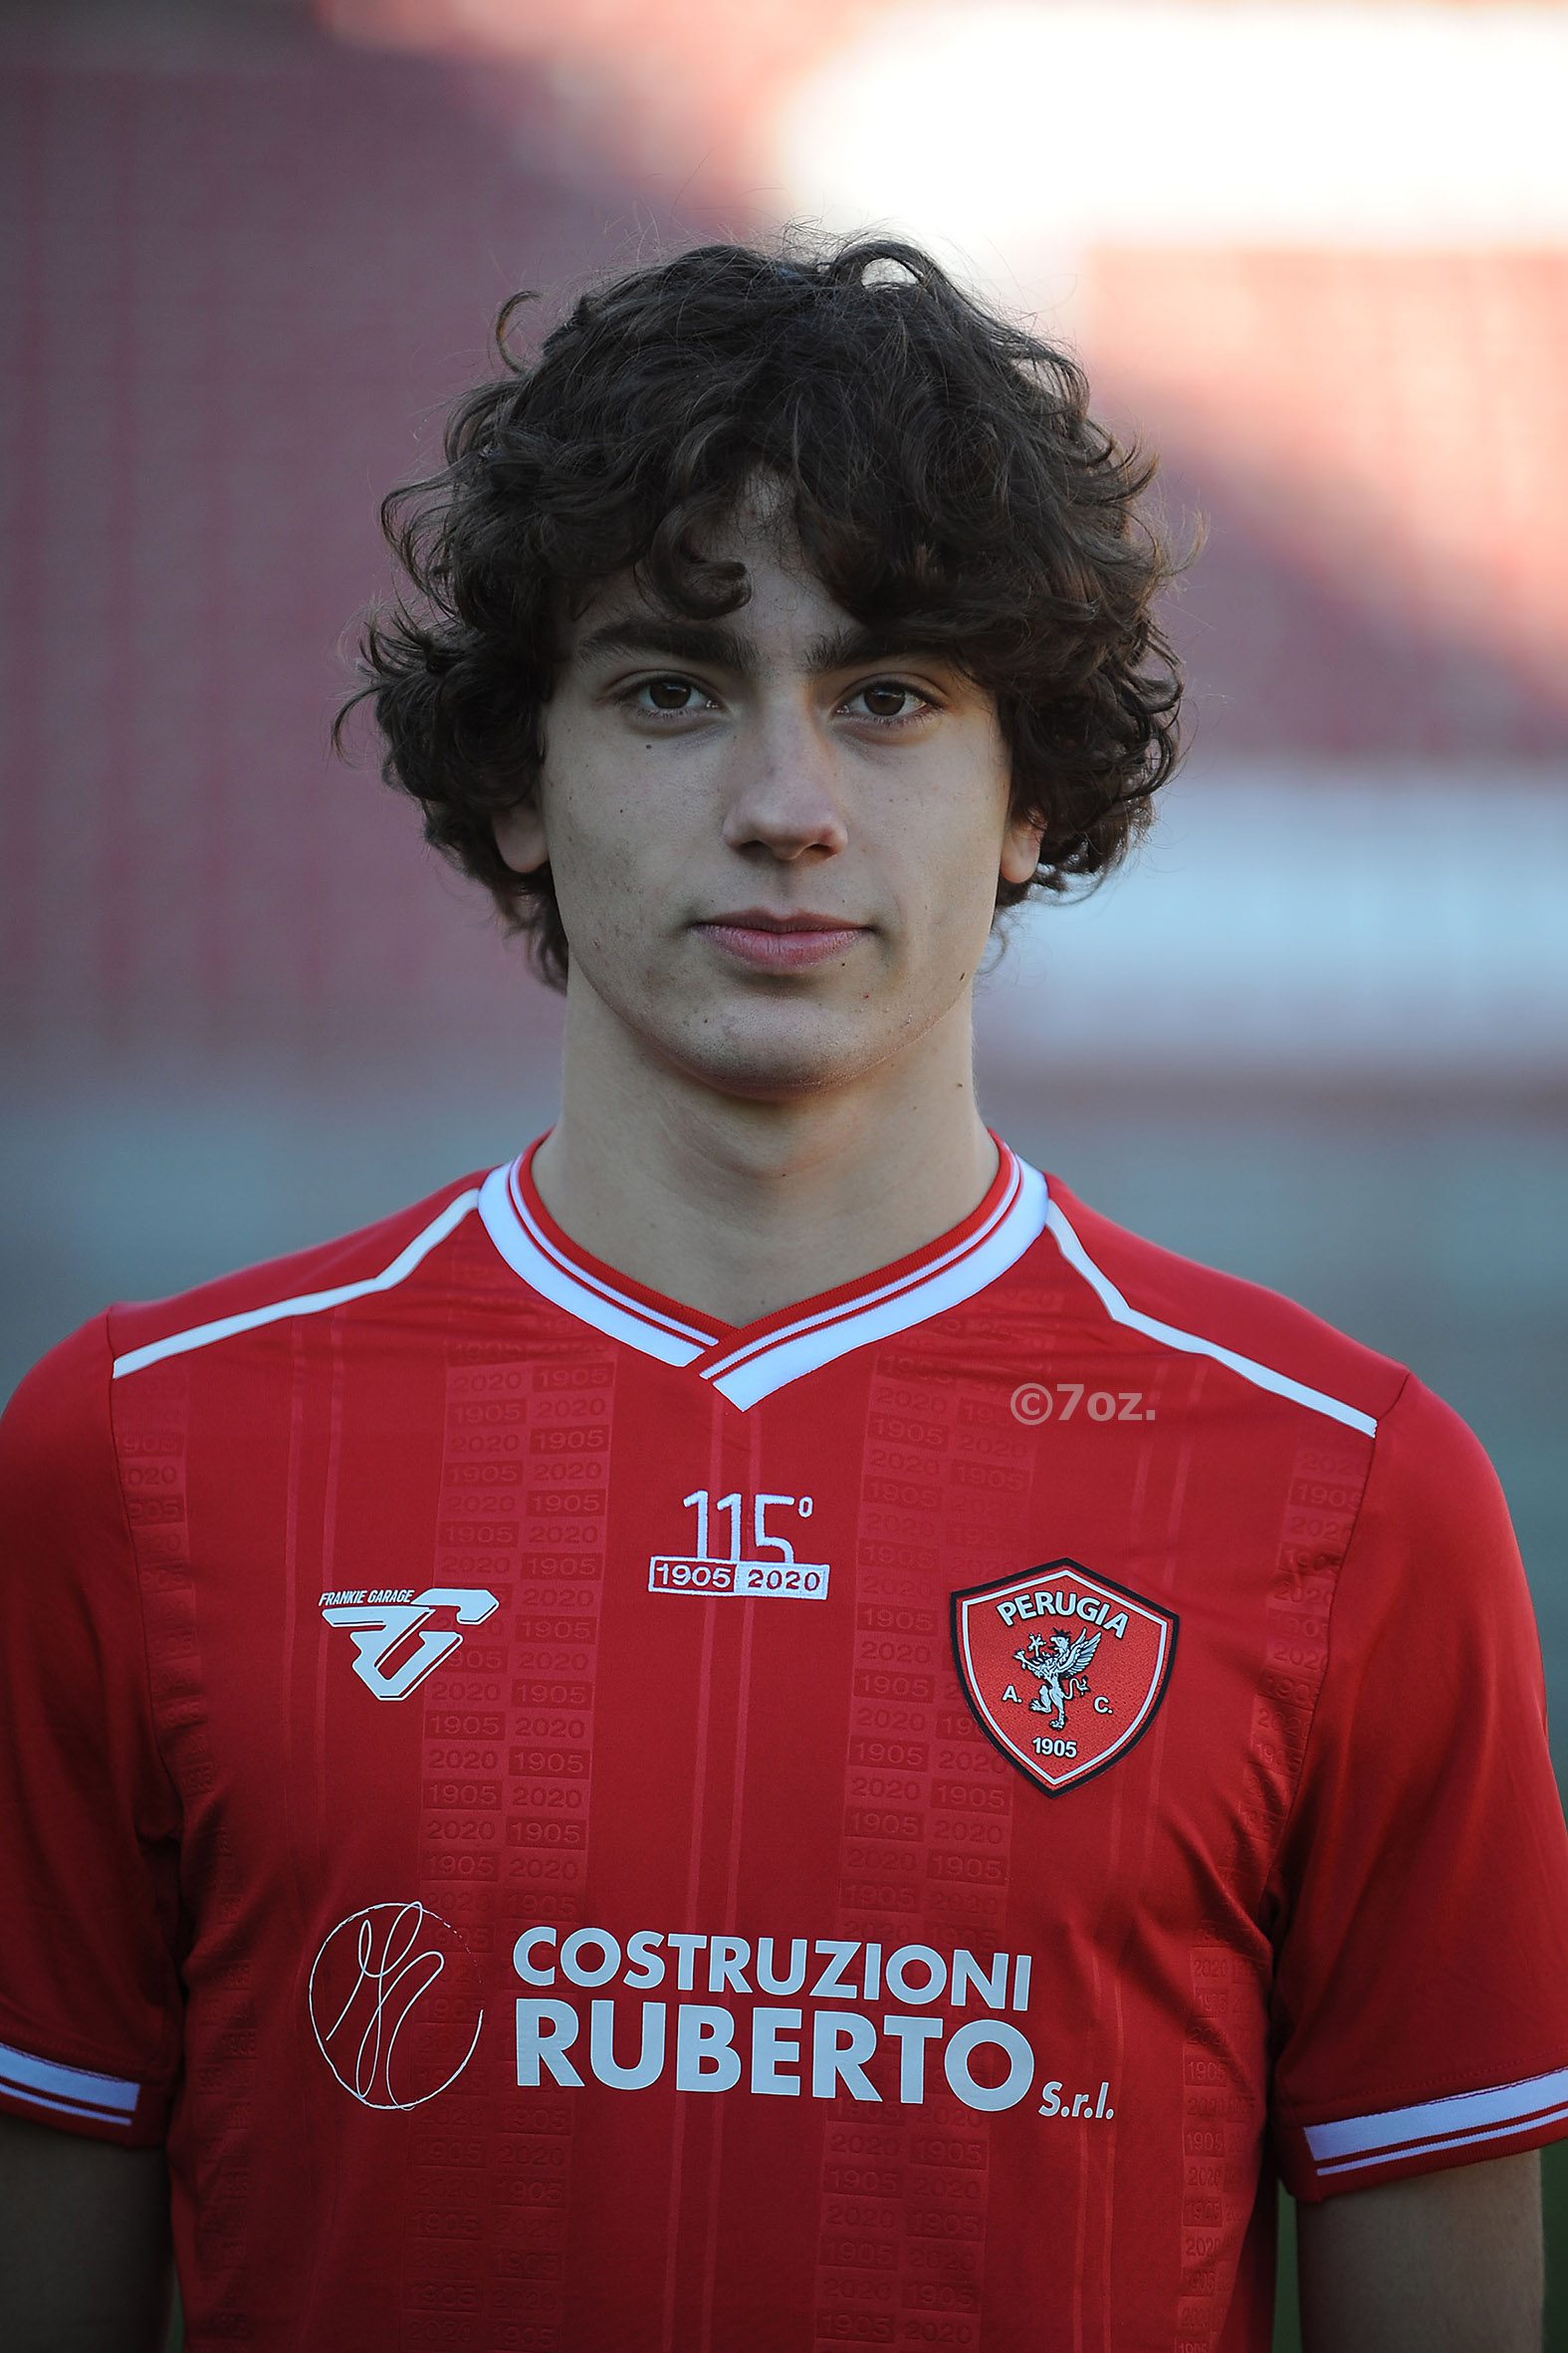 Marco PellegriniDifensore- A.C. Perugia Calcio